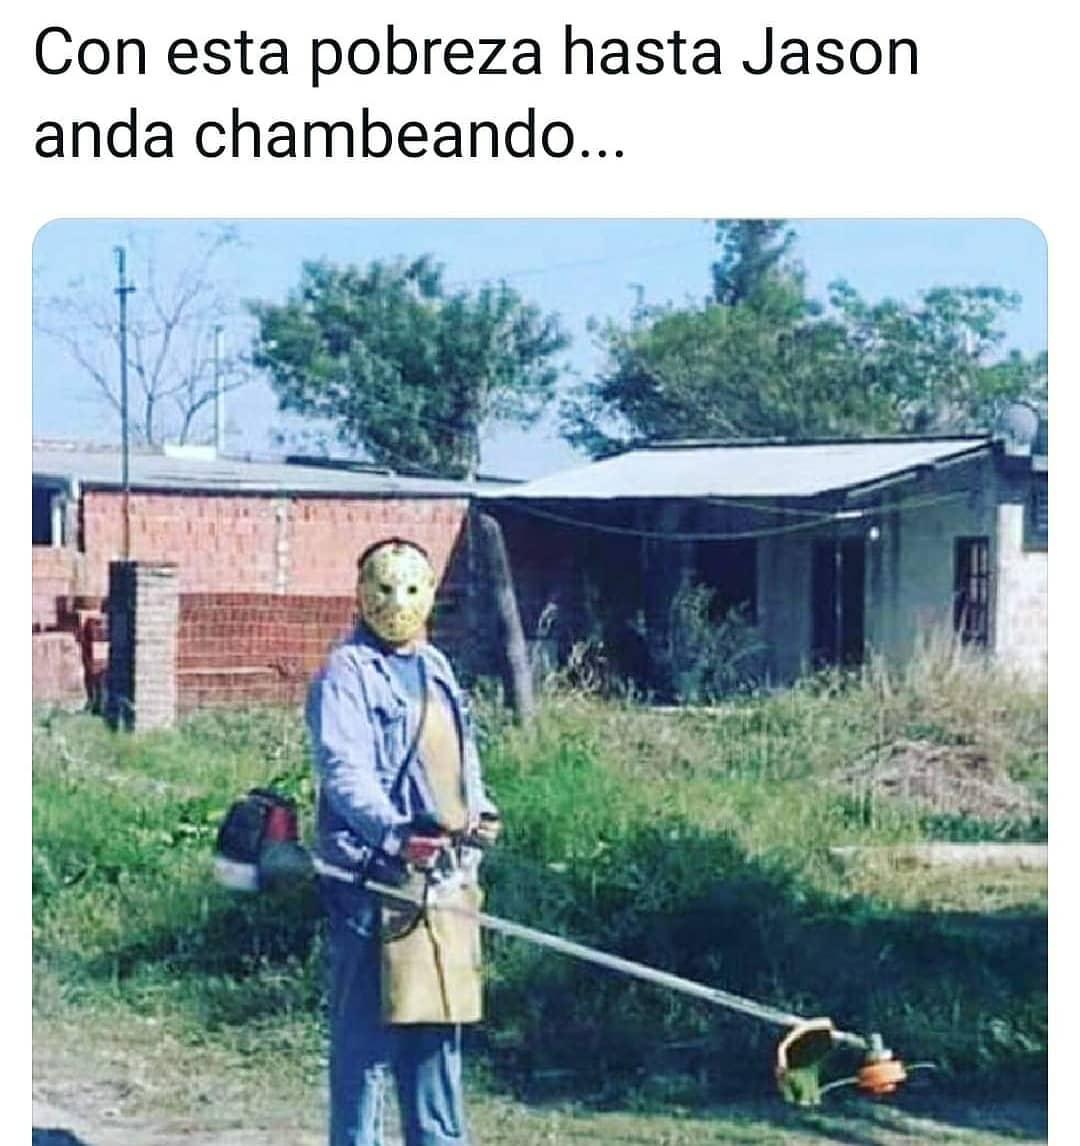 Con esta pobreza hasta Jason anda chambeando...